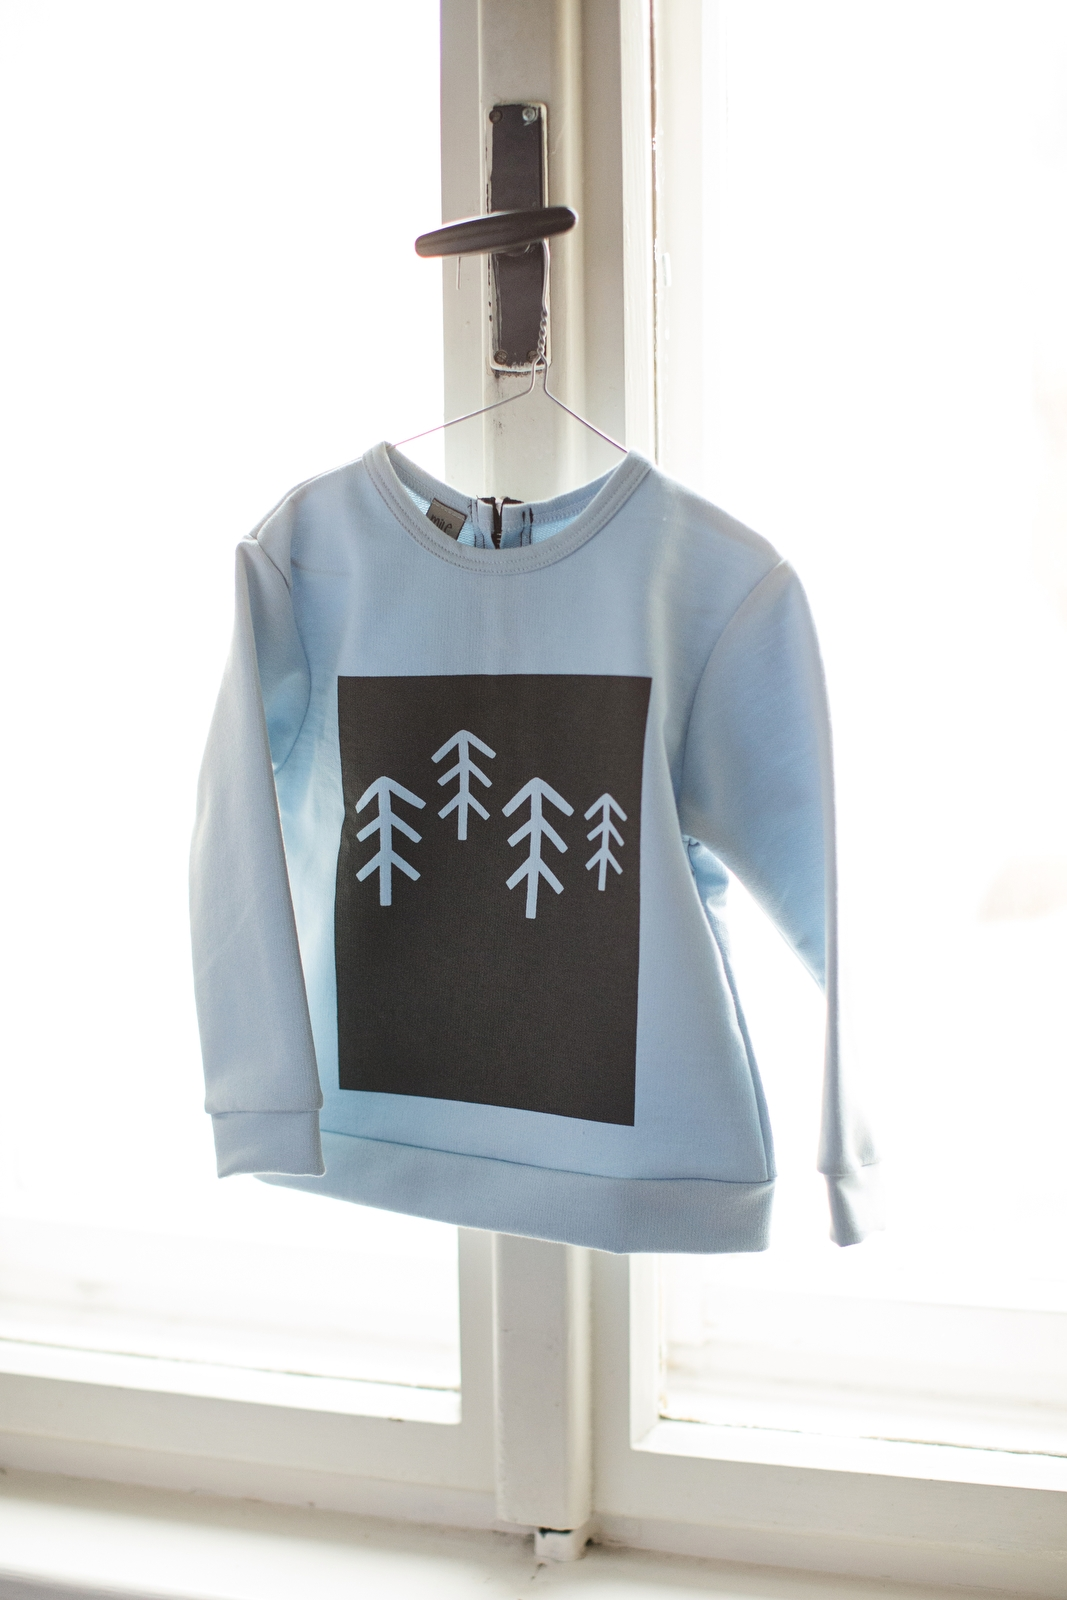 frosty trees sweatshirts